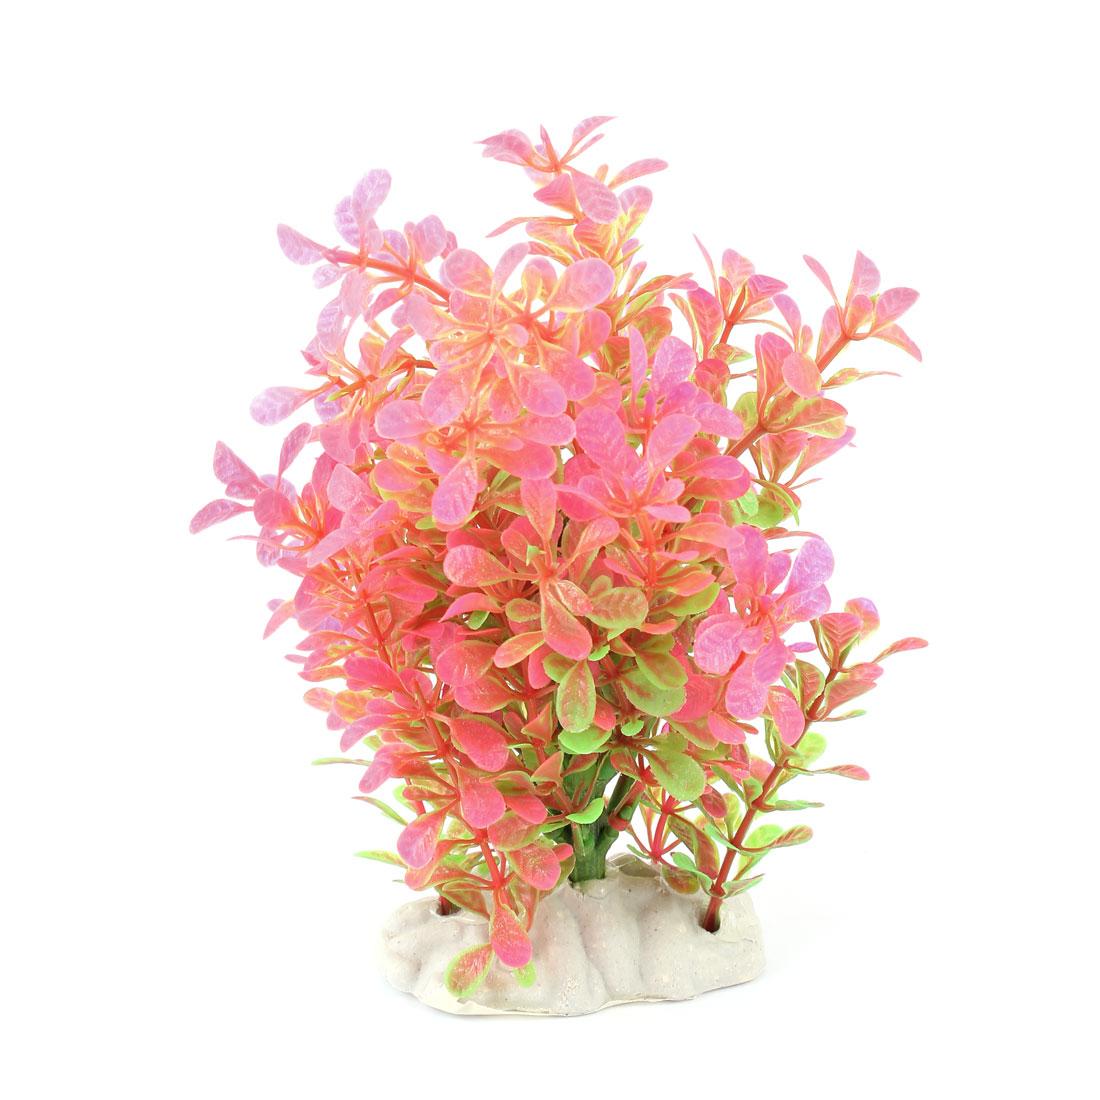 "Aquarium Hot Pink Green Manmade Underwater Plant Ornament 8.3"" High"